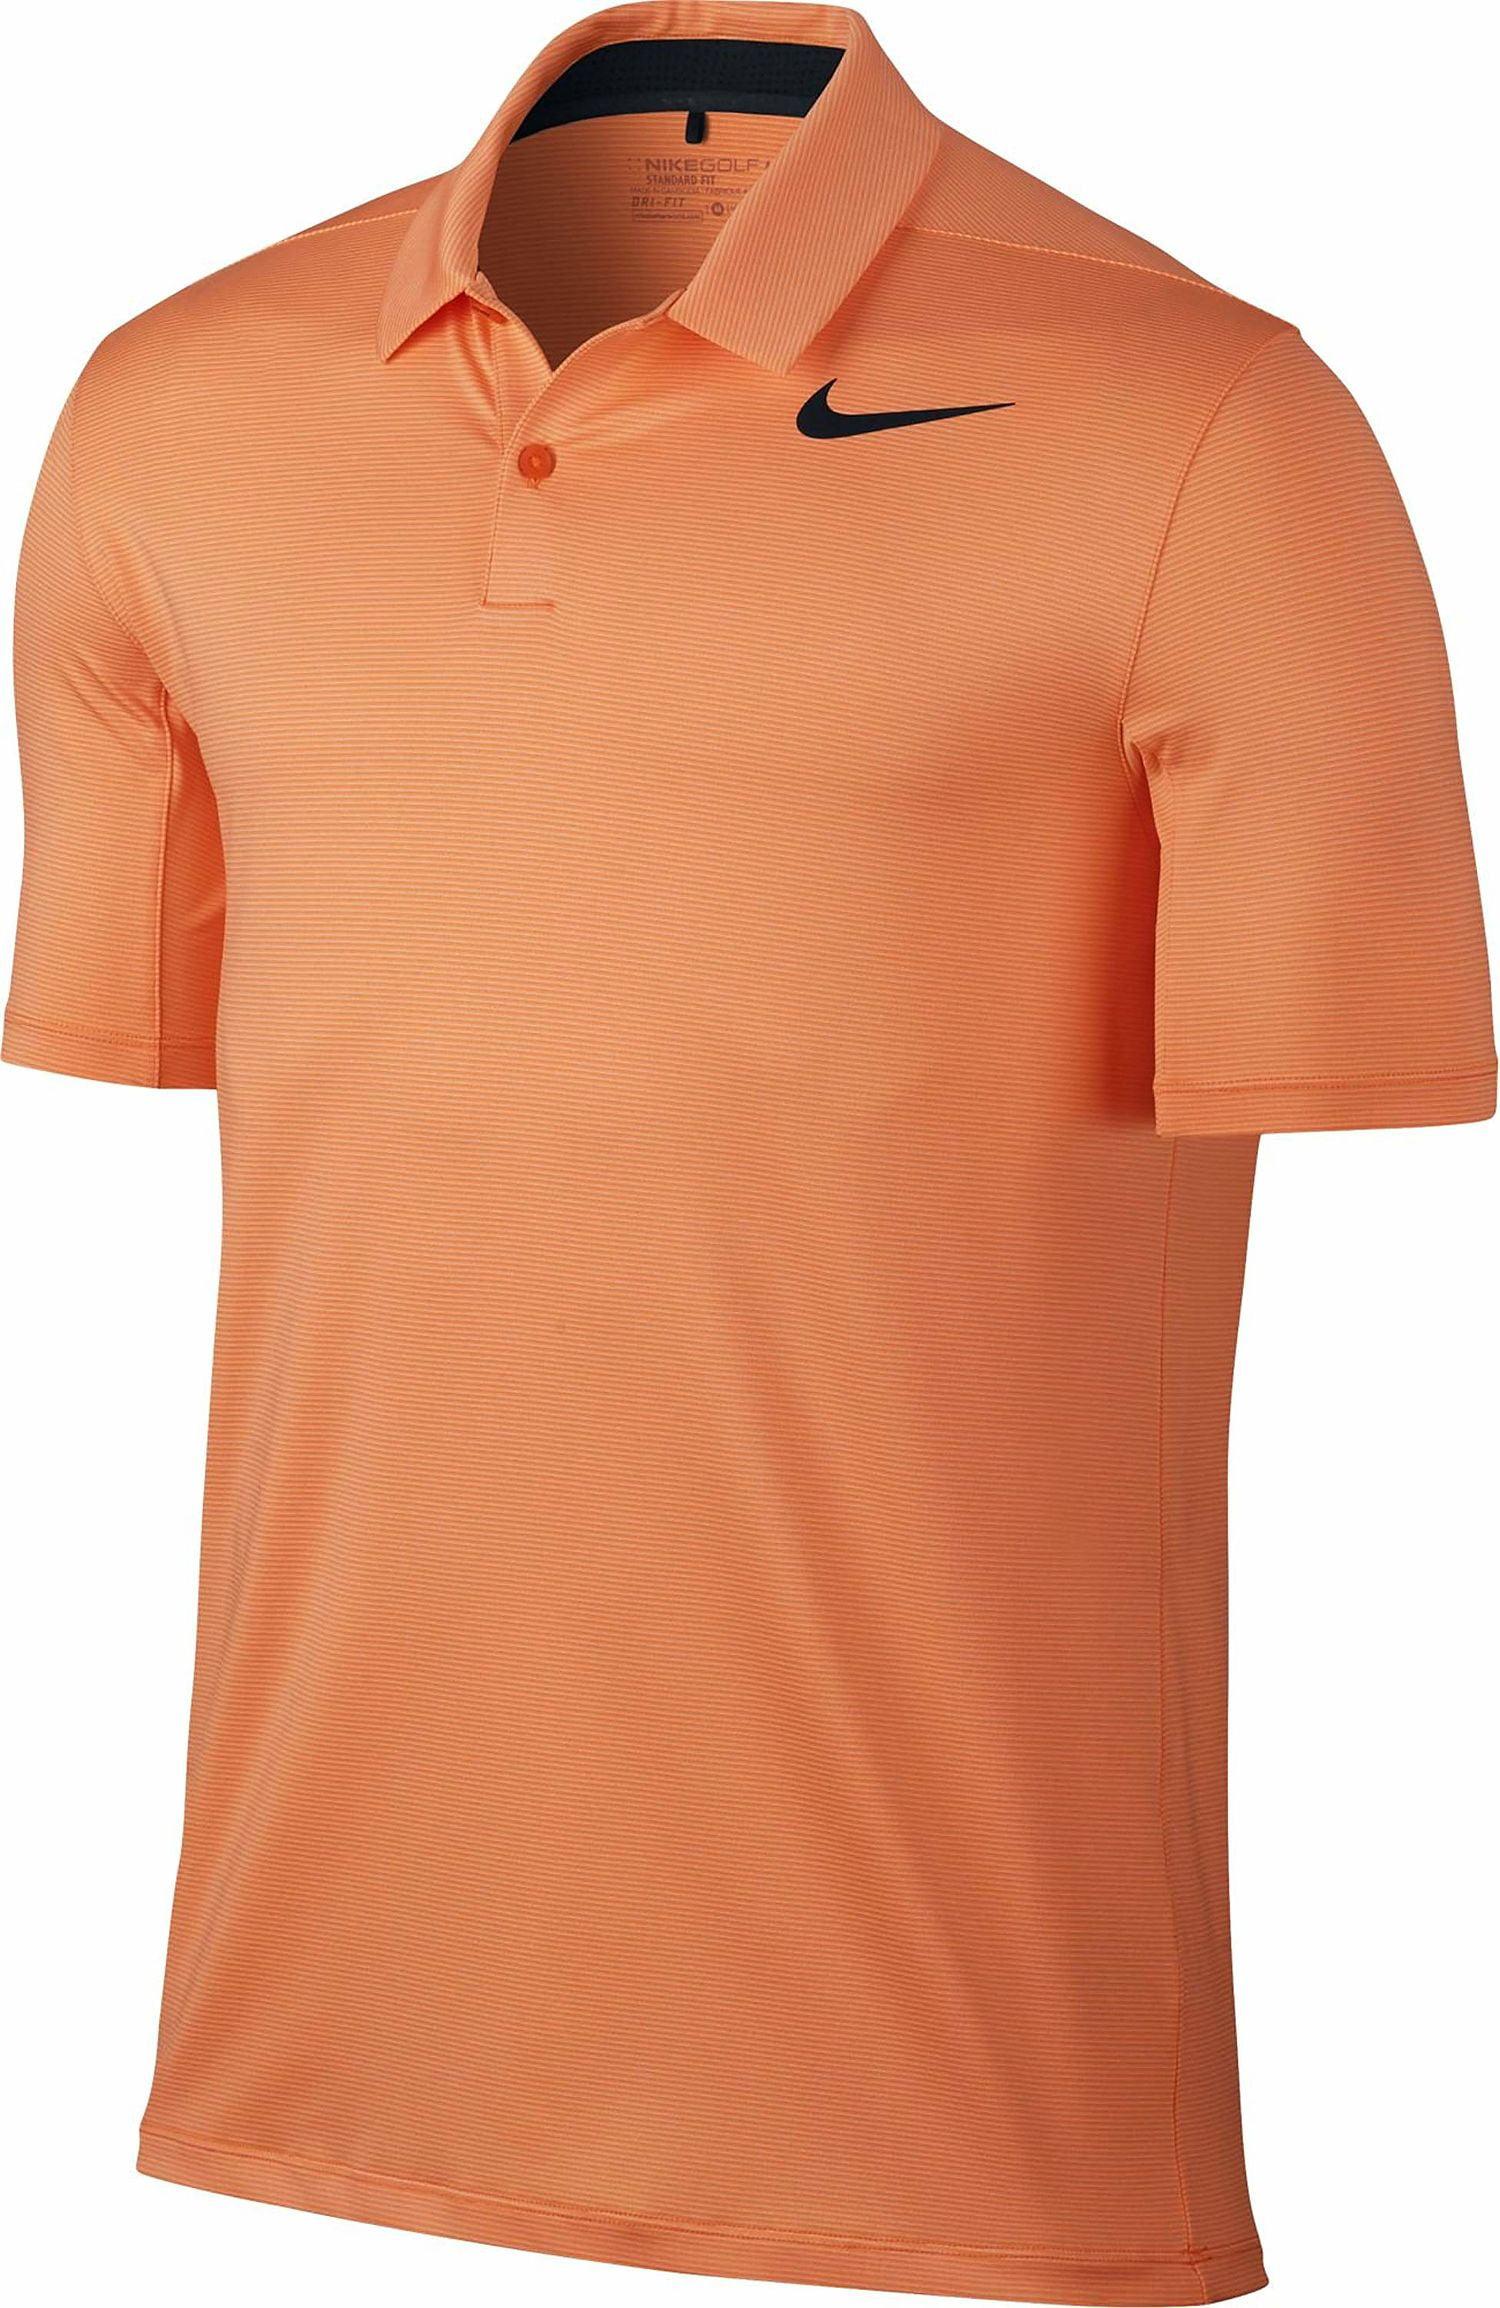 0a9d55e6 Nike 'Dry Control' Mens Orange Micro Striped Polo Shirt